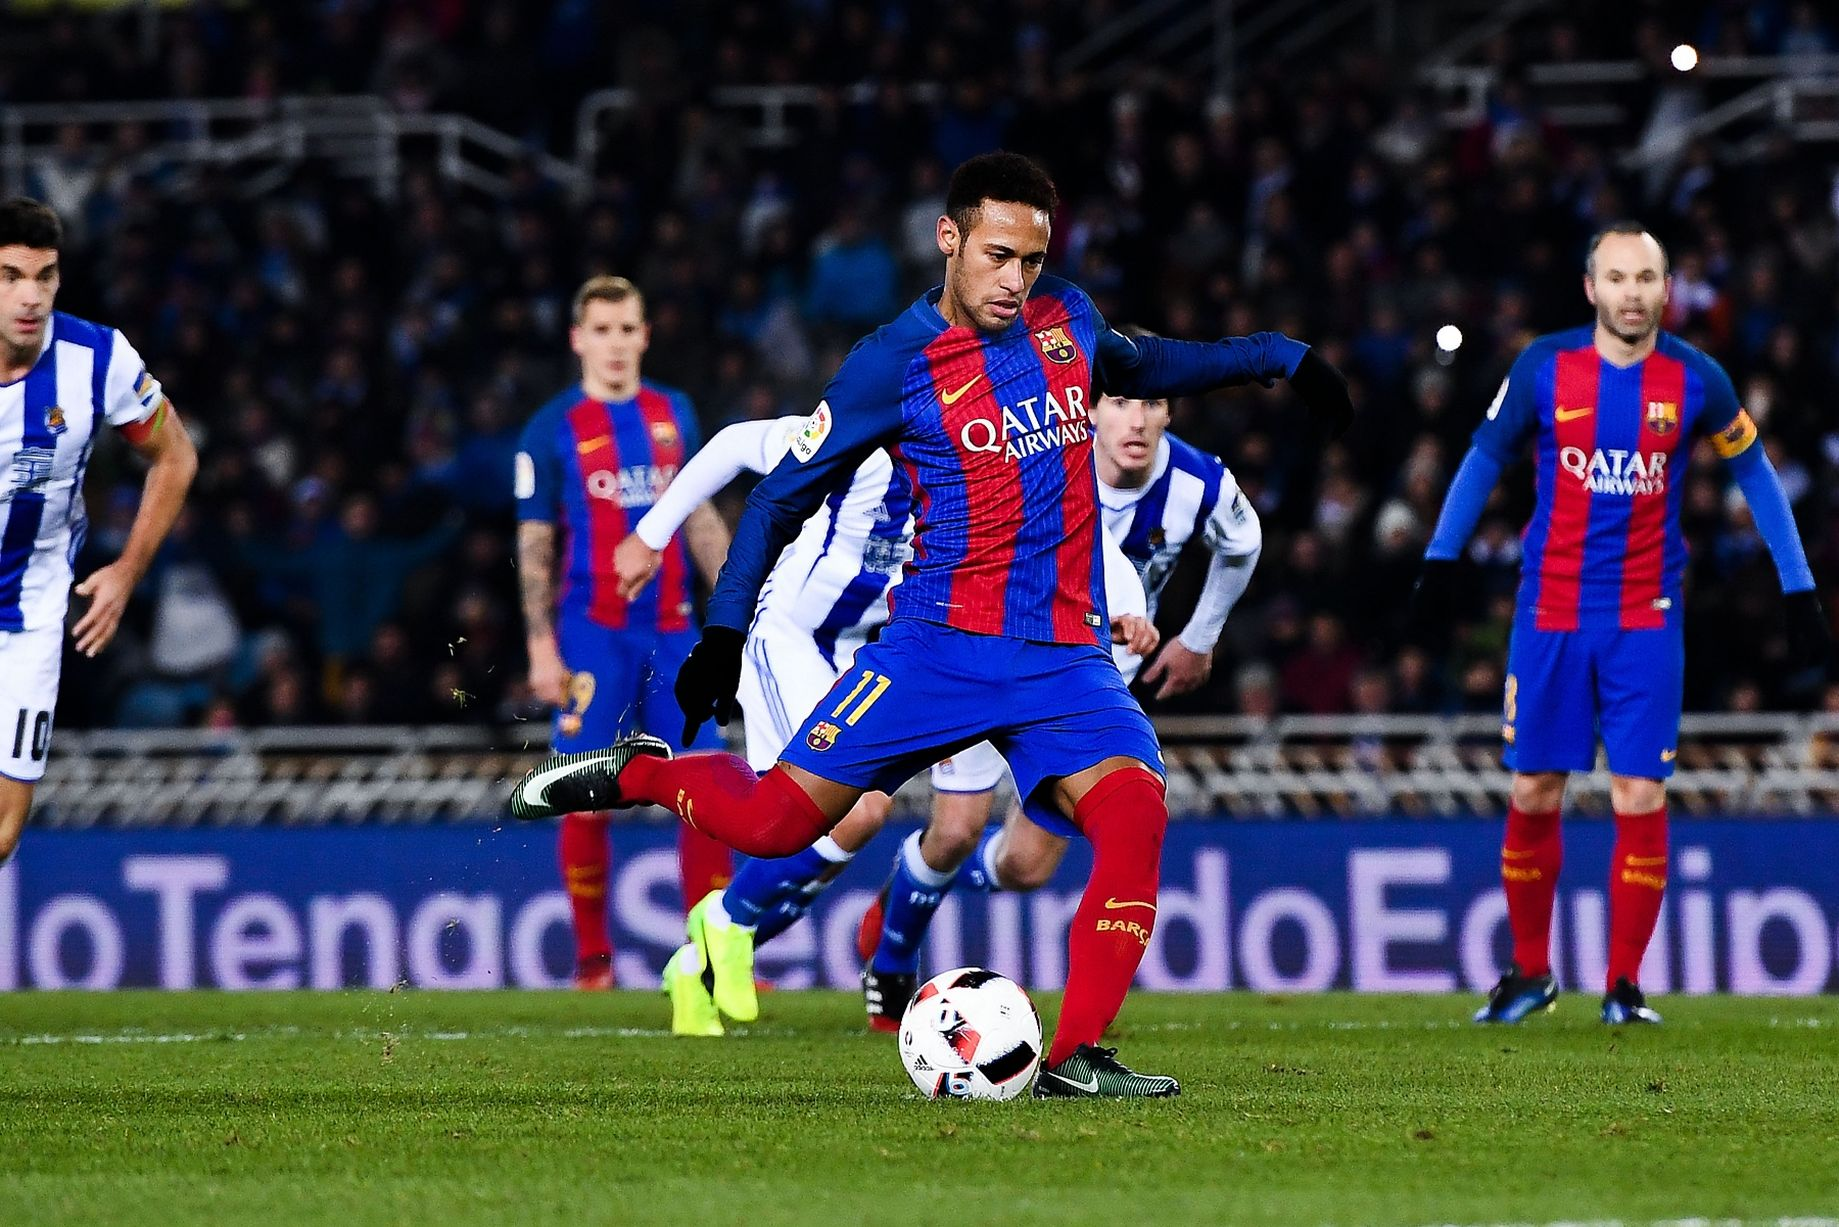 5 điểm nhấn Real Sociedad 0-1 Barca: Khi 'lời nguyền' được phá bỏ